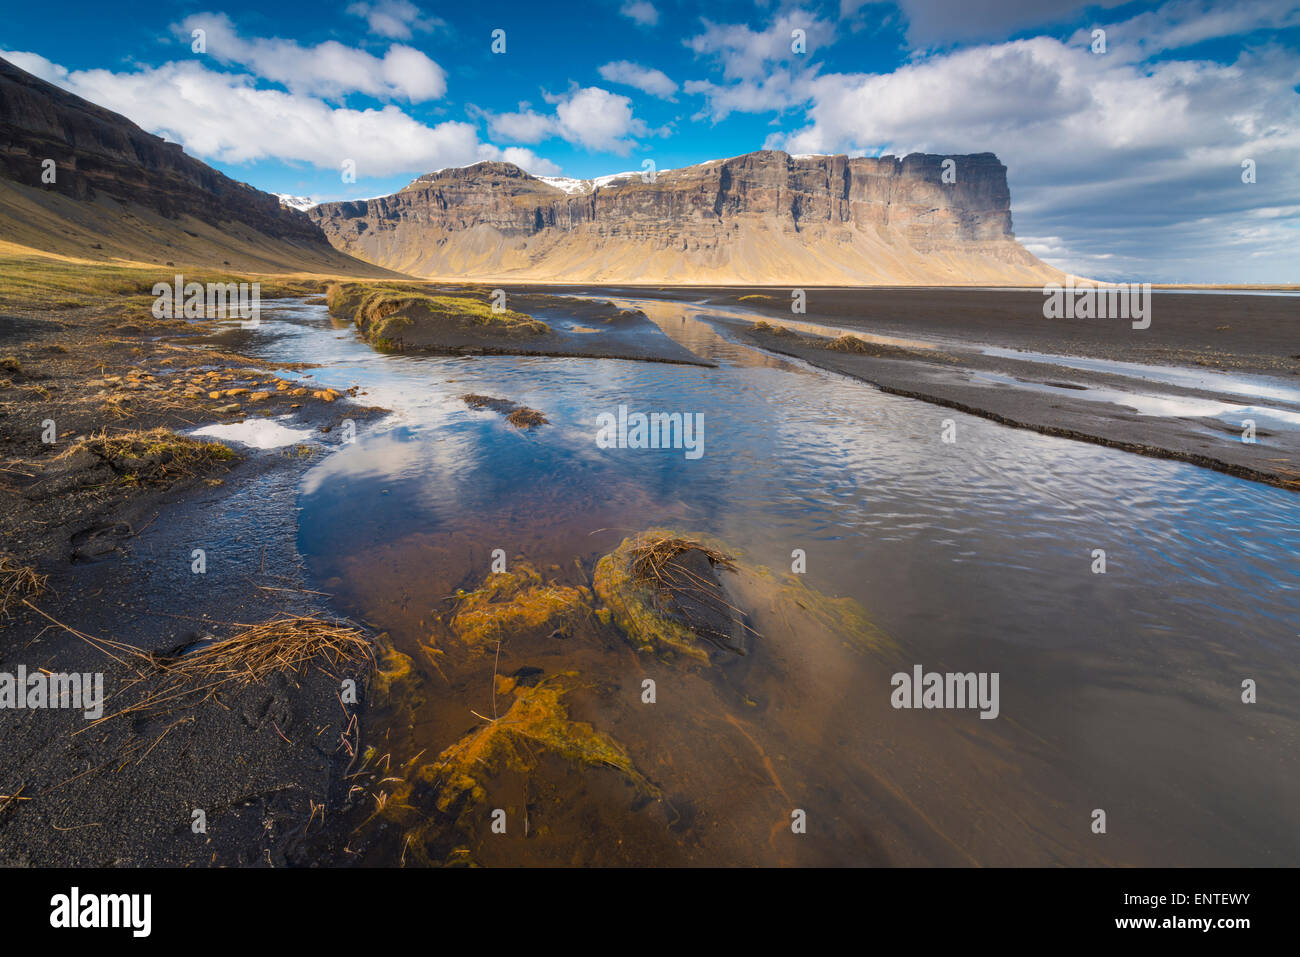 Iceland, landscape - Lomagnupur cliffs near Nupsstadur on the Skeidararsandur Plain - Stock Image